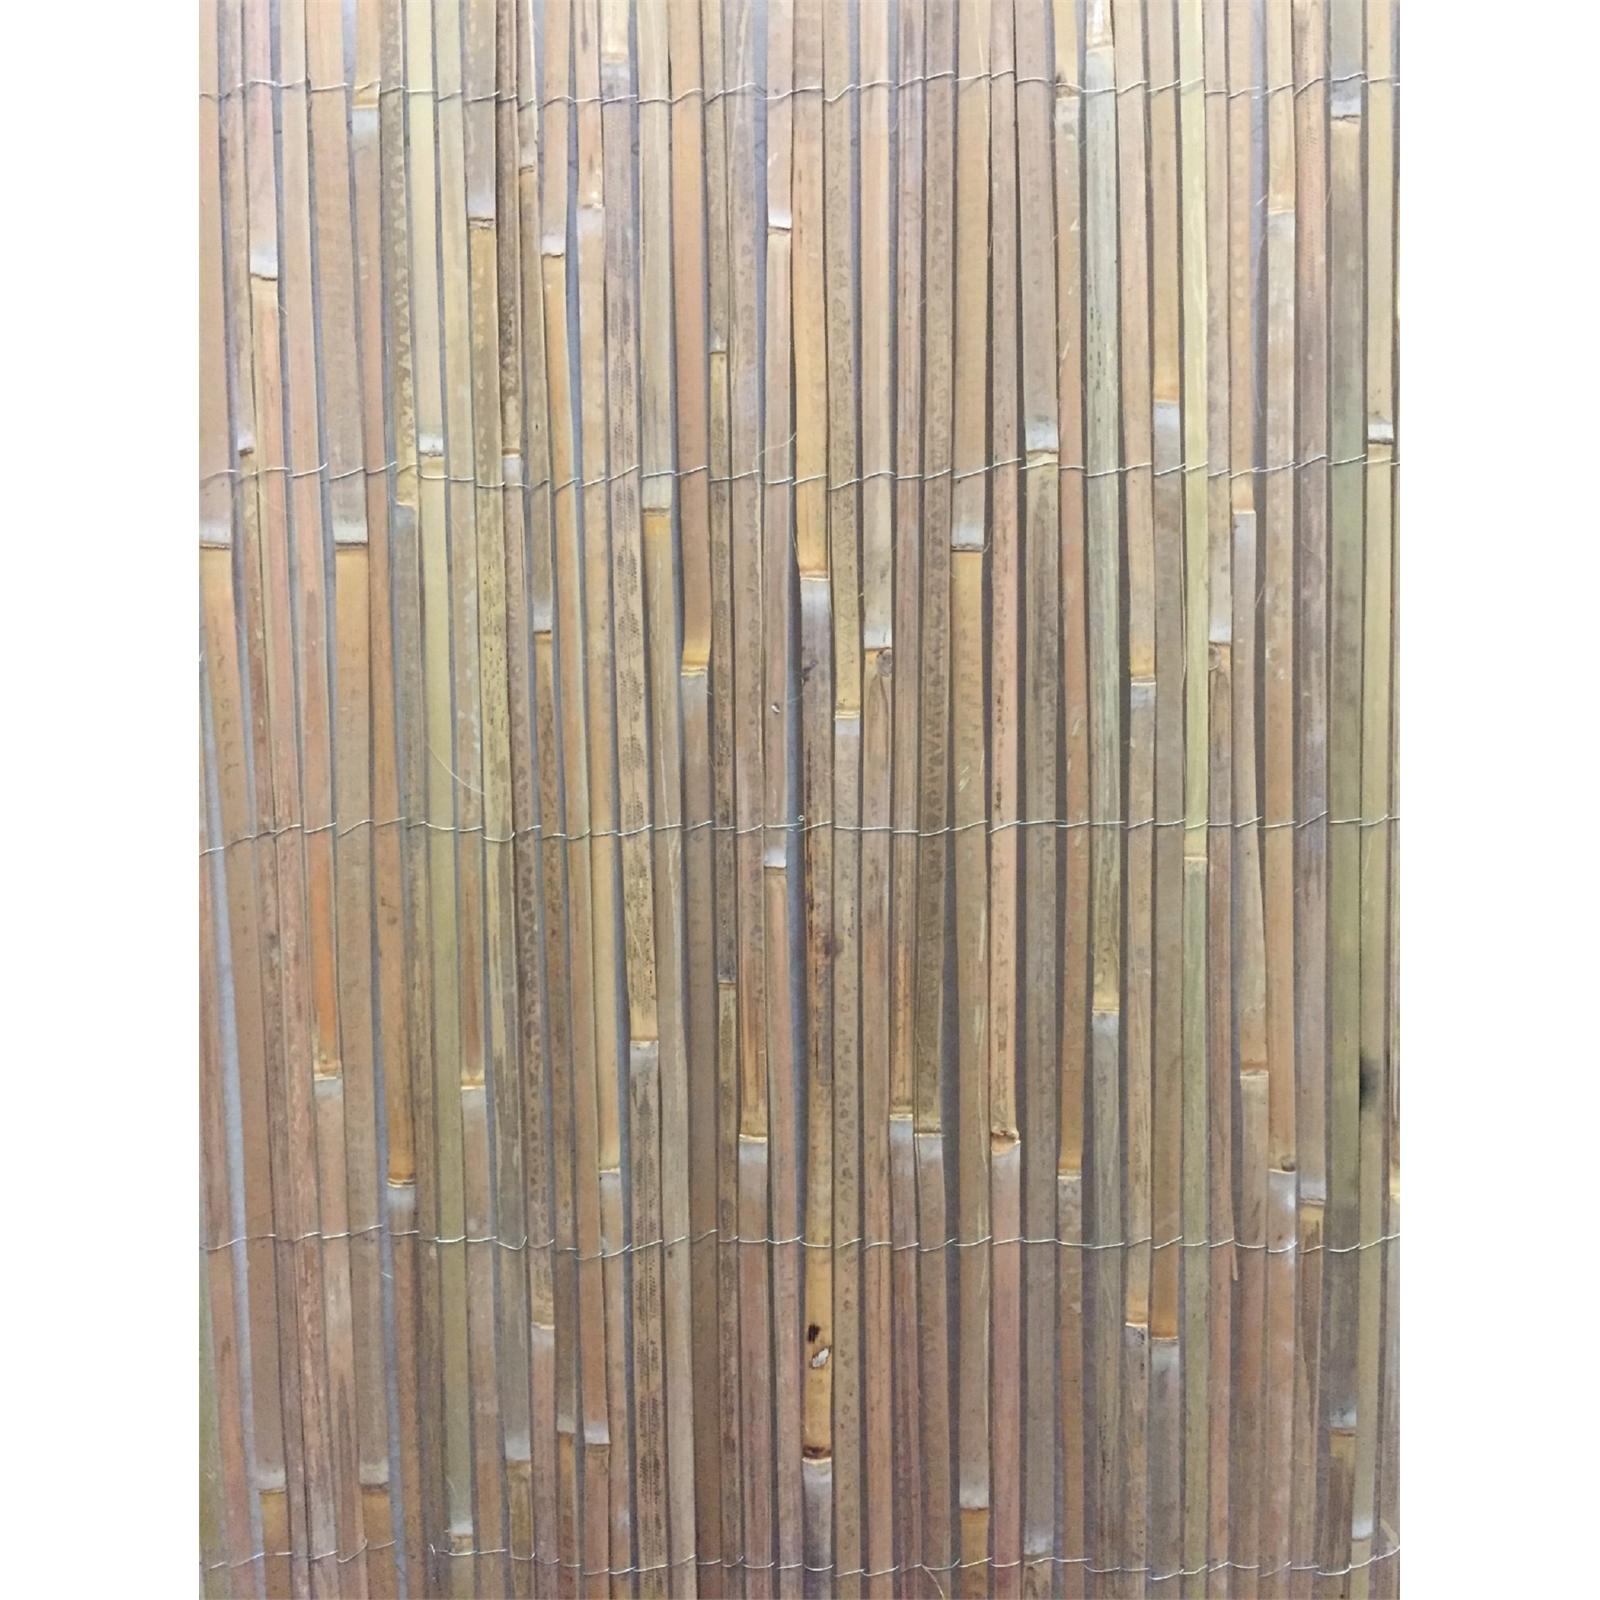 EDEN 1.5 x 3m Bamboo Slat Screen Fencing